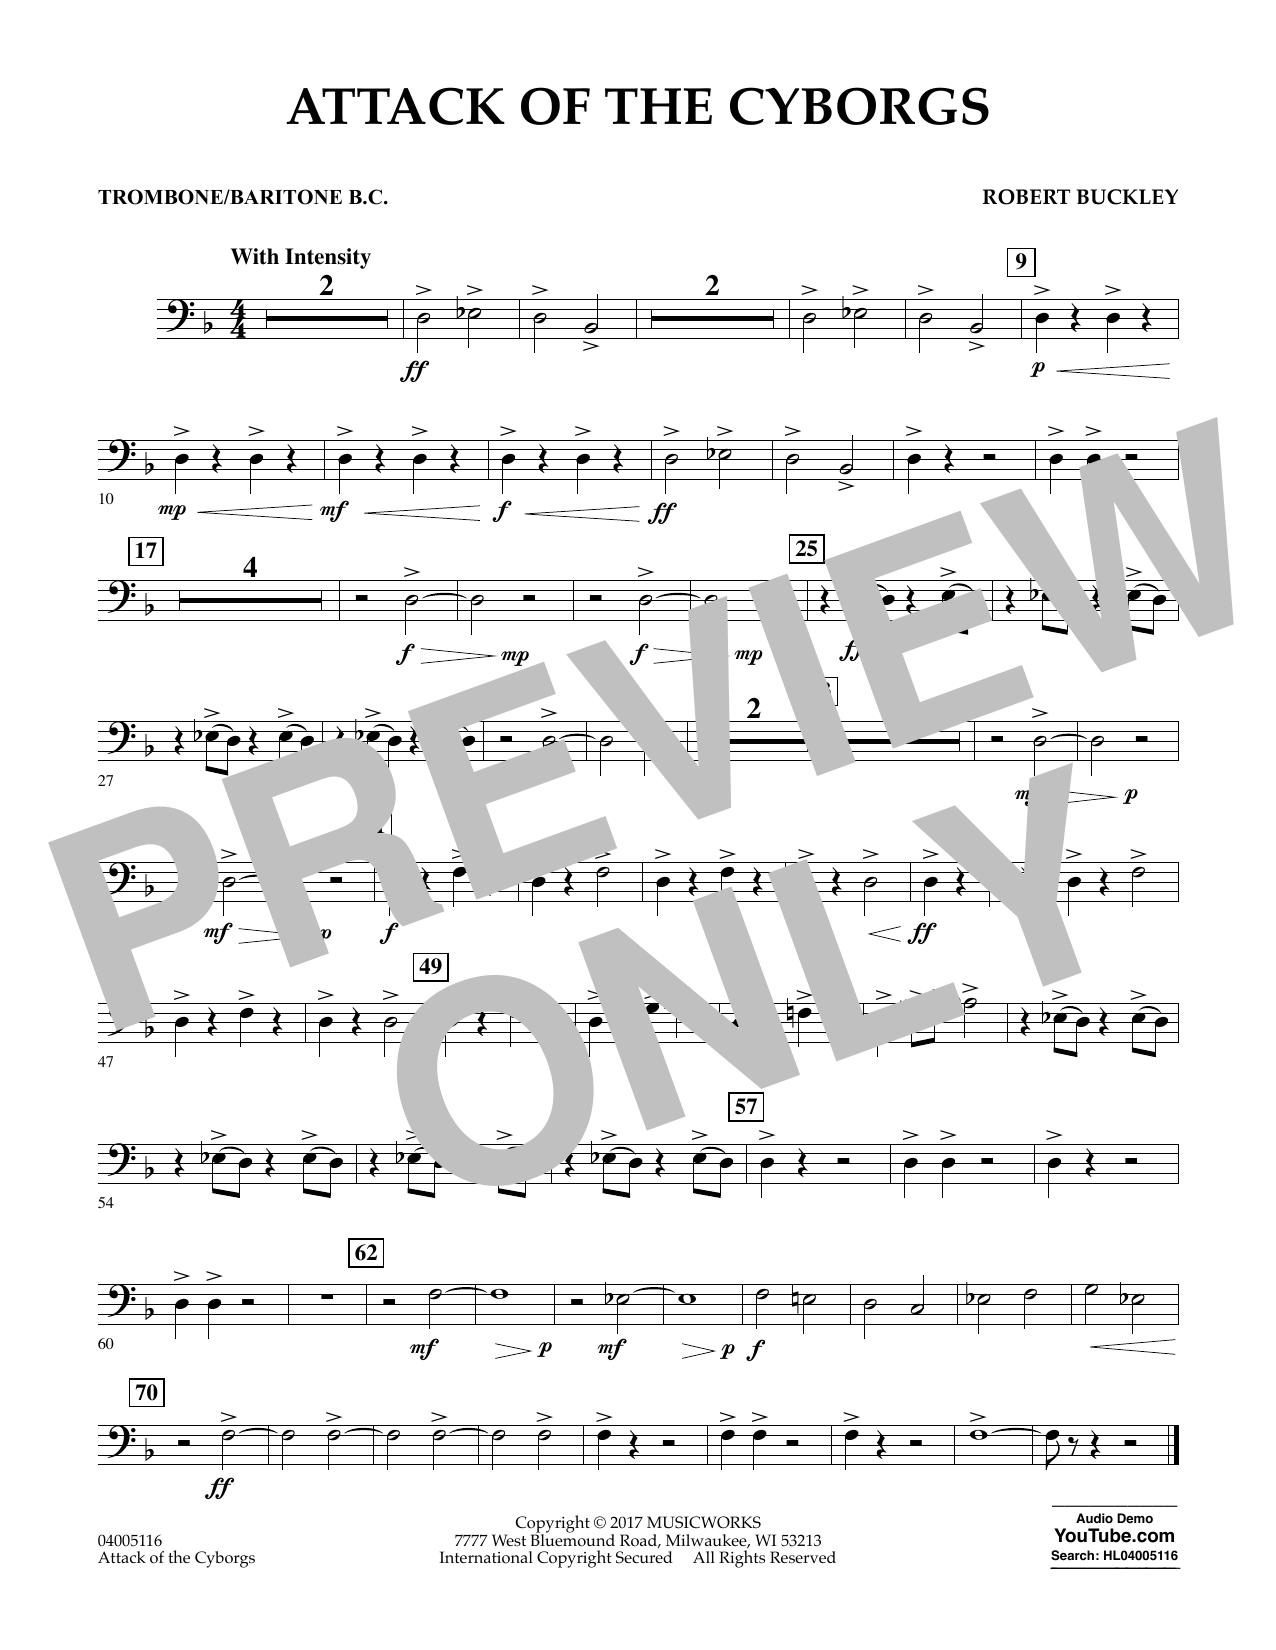 Attack of the Cyborgs - Trombone/Baritone B.C. Sheet Music